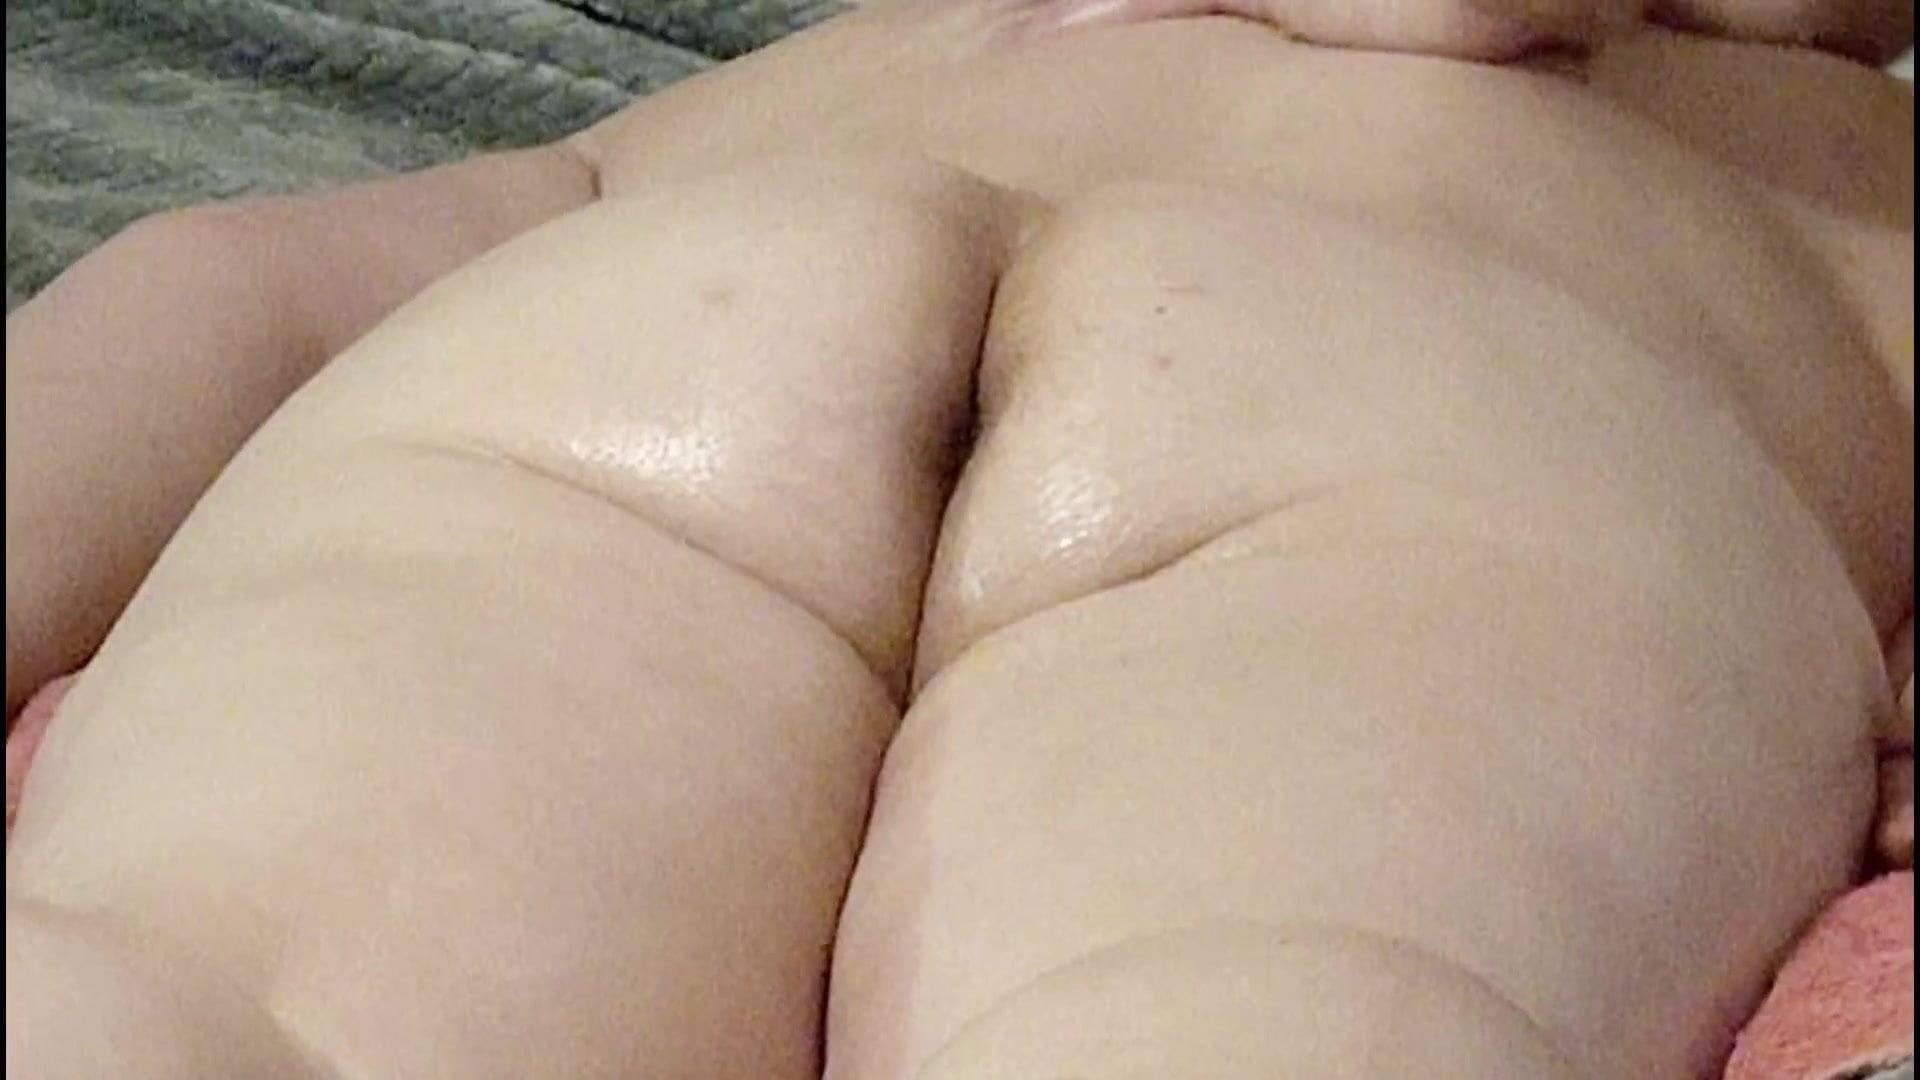 PAWG Candy Thick Bushy Ass Rubdown